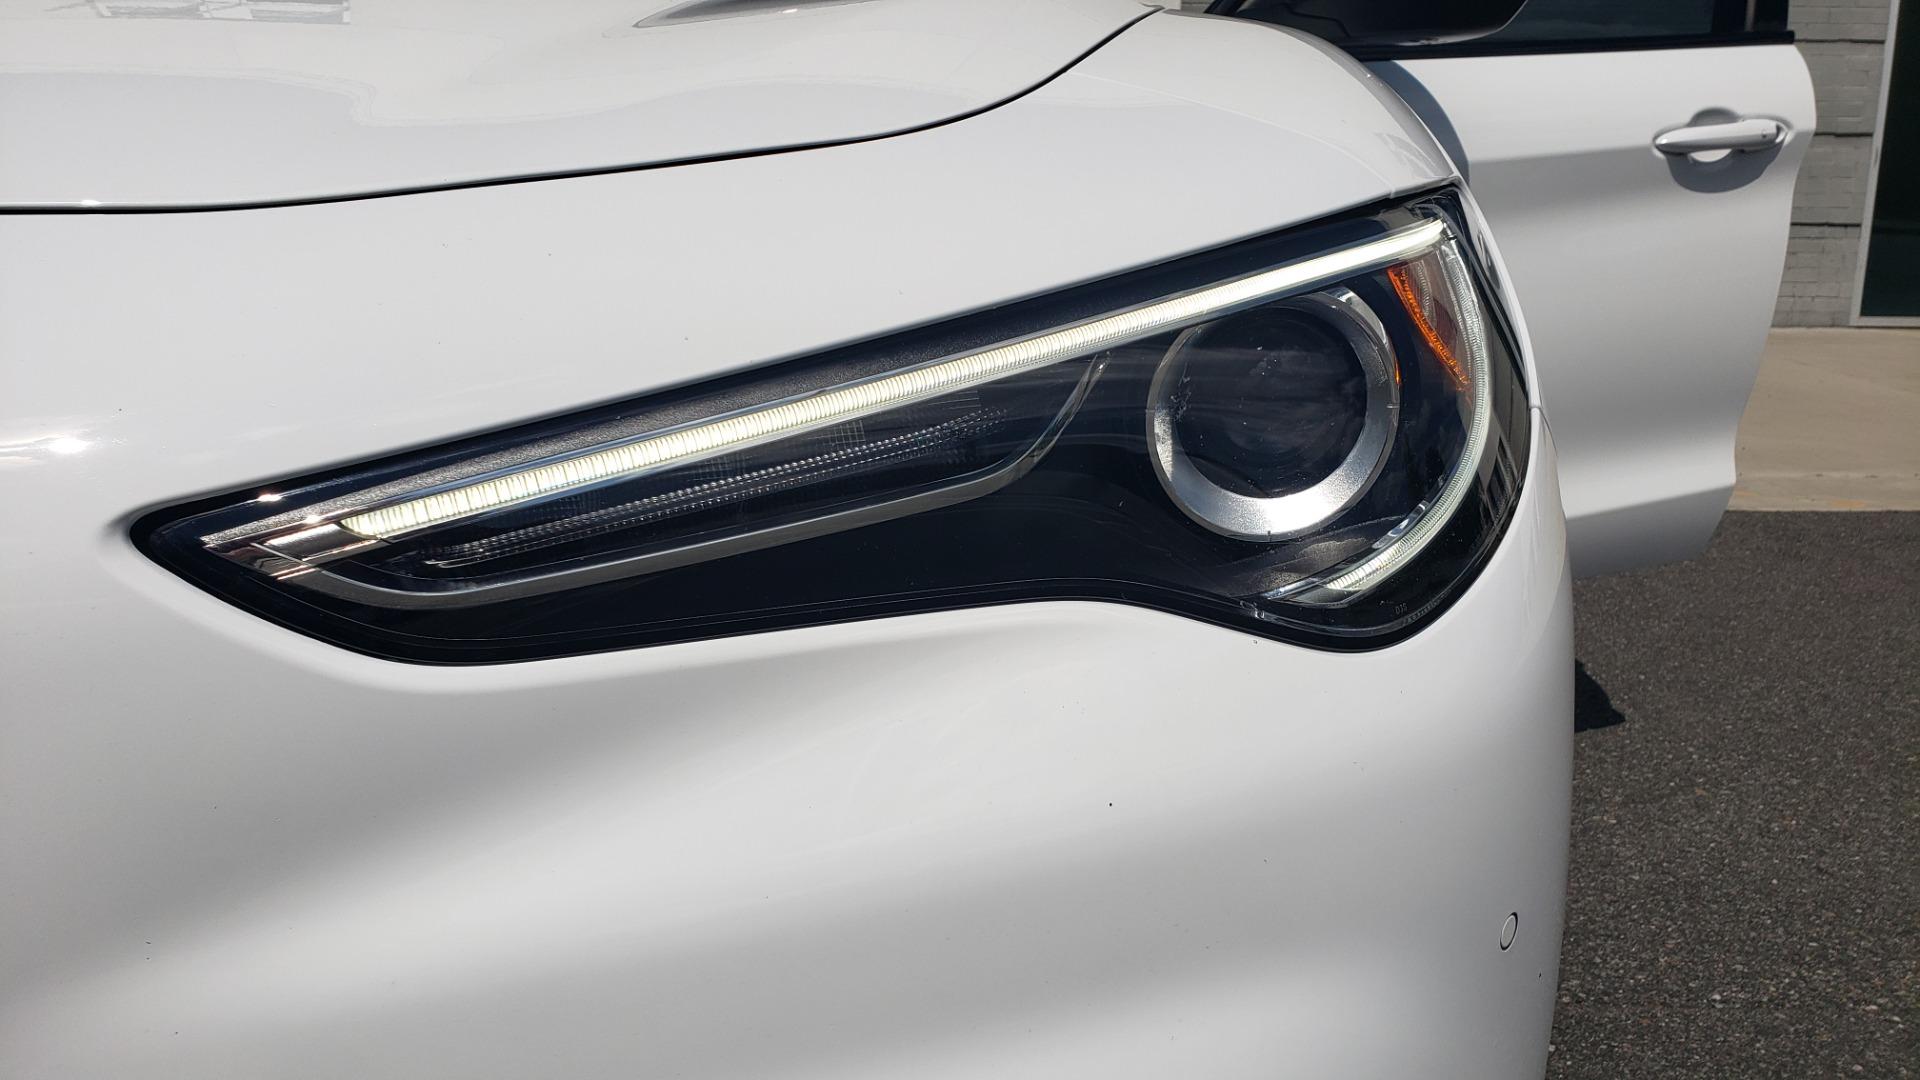 Used 2019 Alfa Romeo STELVIO TI SPORT AWD / 2.0L TURBO / 8-SPD AUTO / DRVR ASST / REARVIEW for sale $37,495 at Formula Imports in Charlotte NC 28227 27